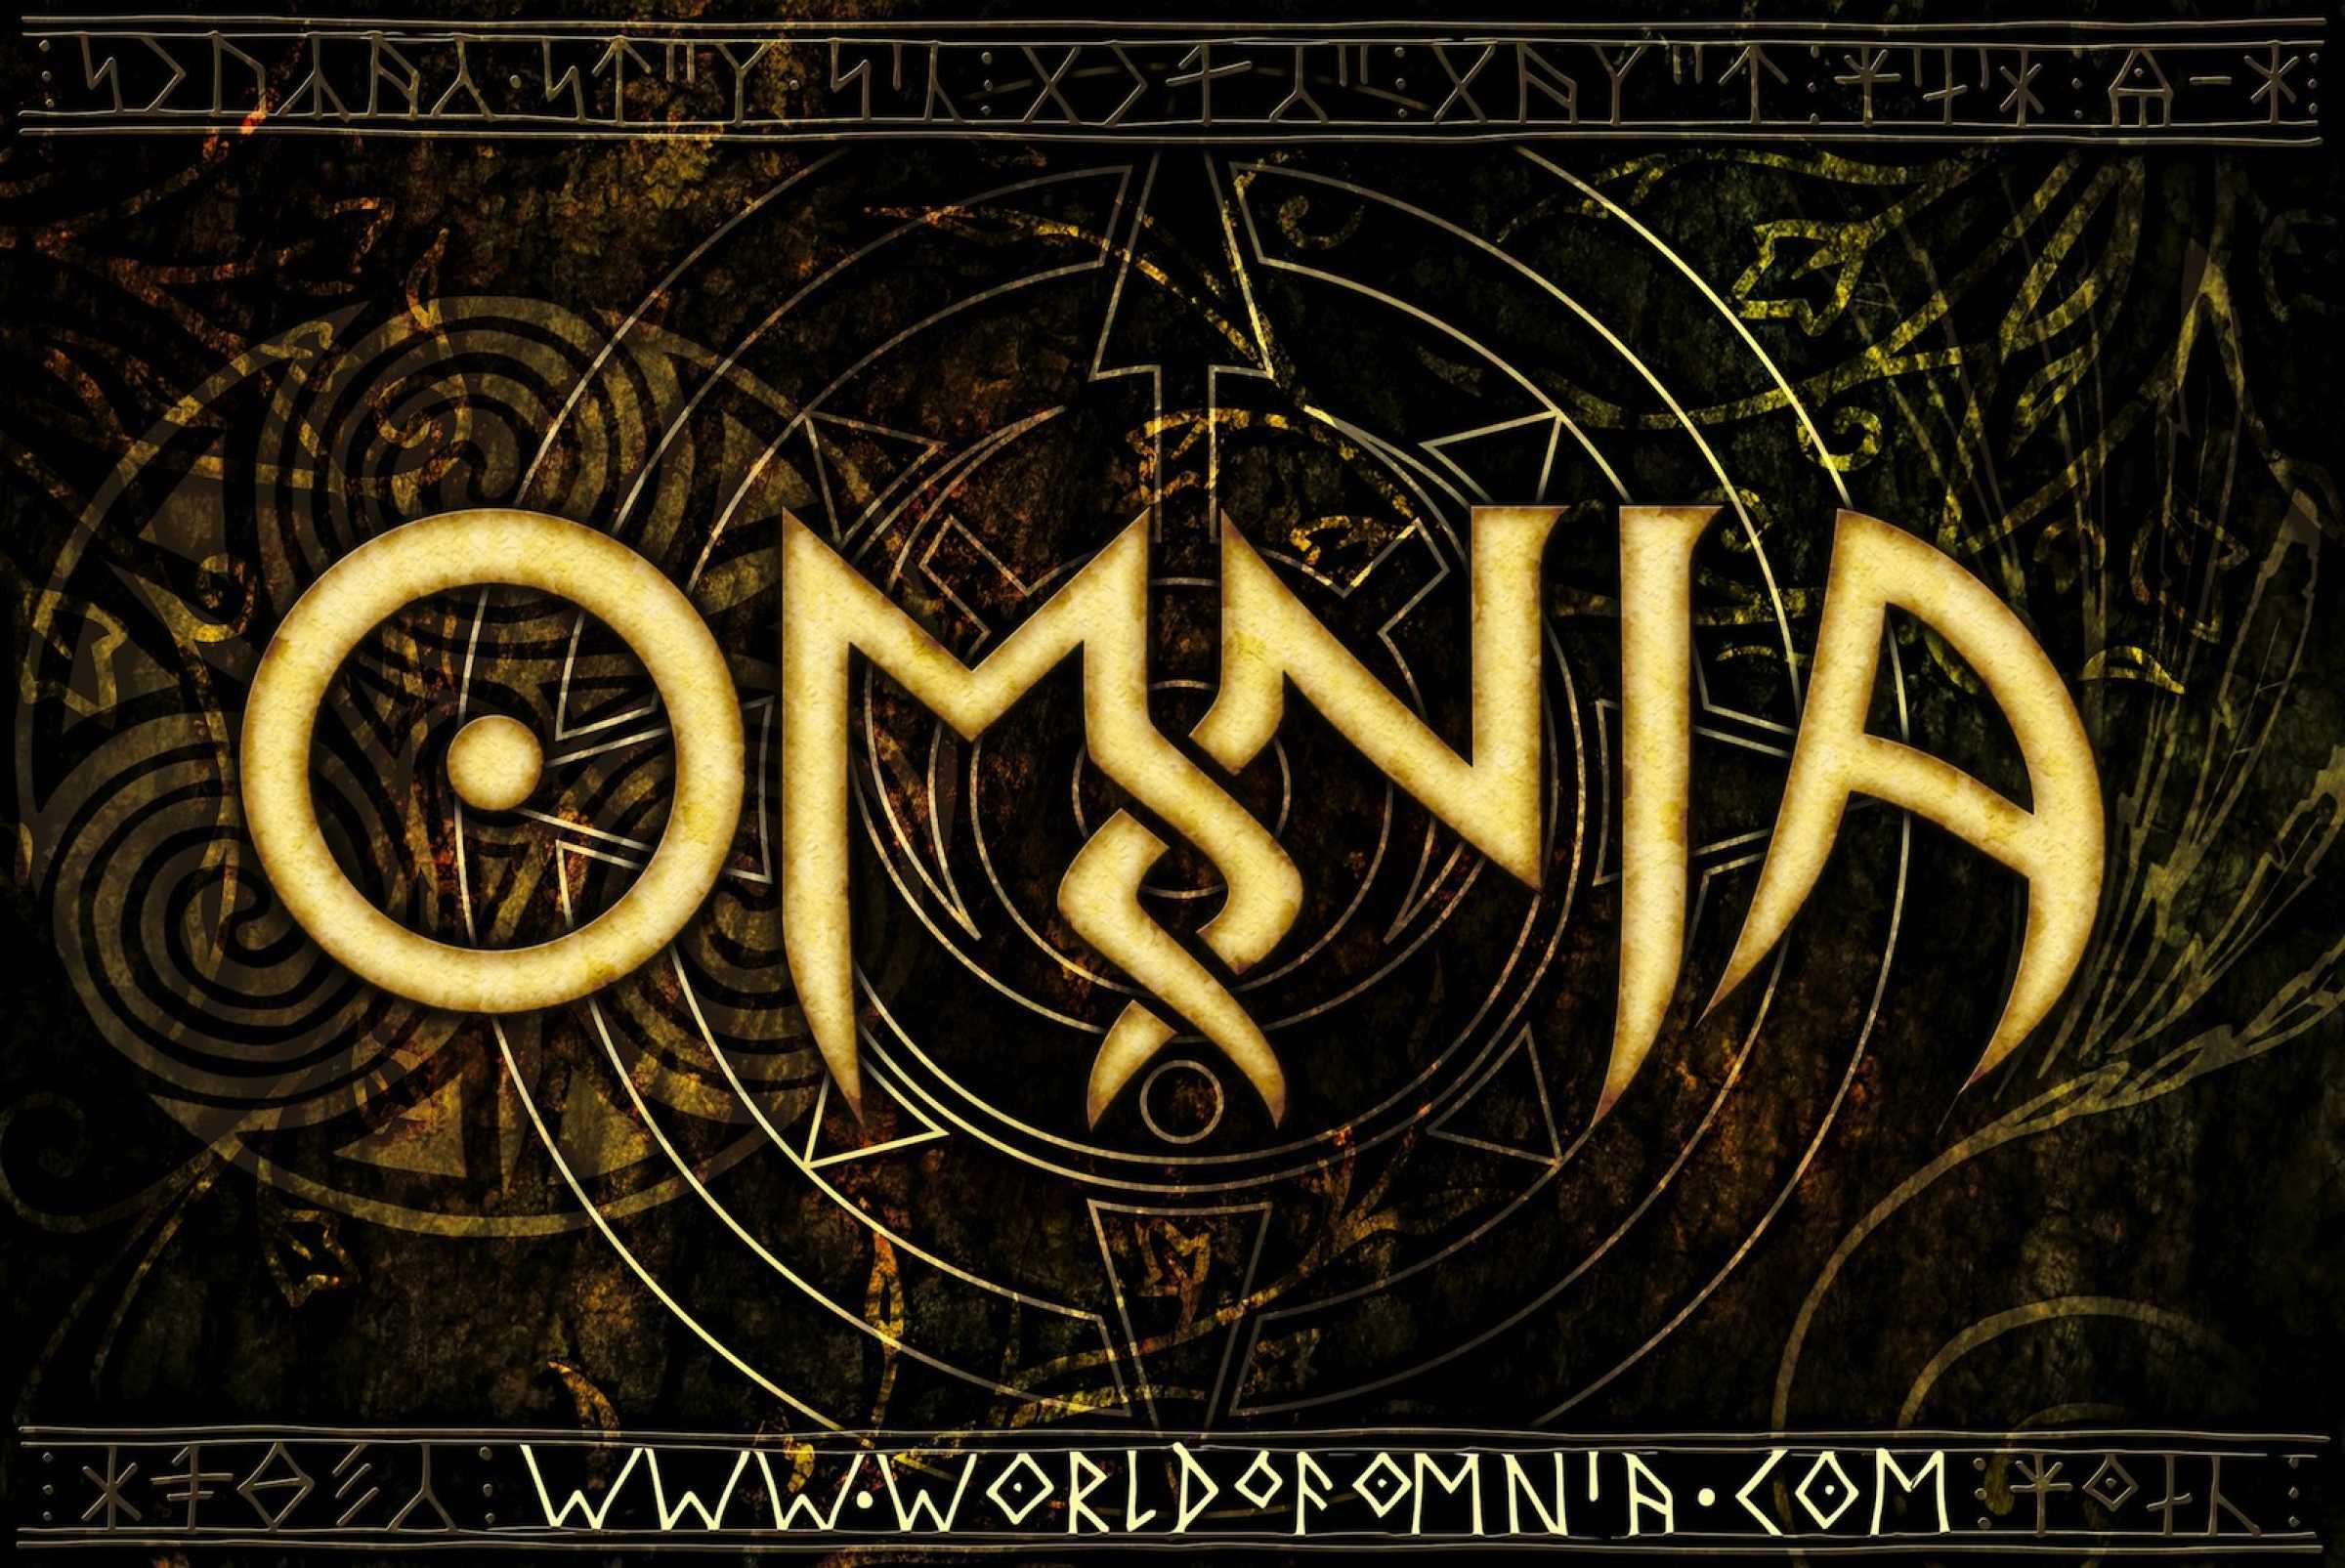 world of omnia sticker world of omnia. Black Bedroom Furniture Sets. Home Design Ideas